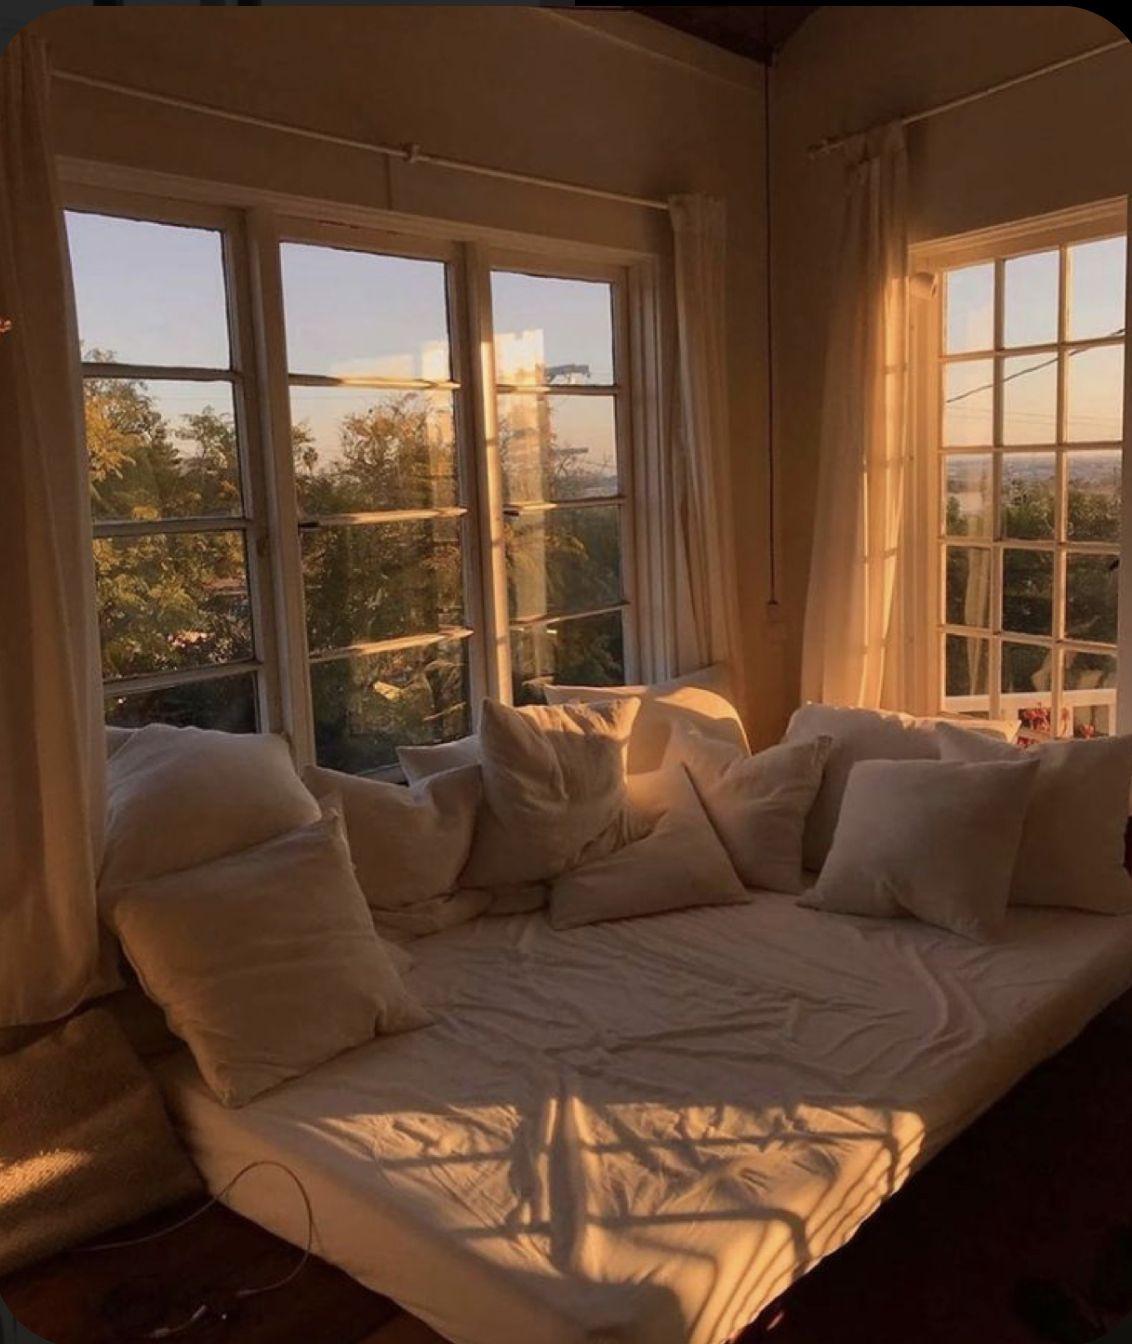 Pin By Morgan Lackey On I N T E R I O R In 2020 Aesthetic Bedroom Dream Rooms Aesthetic Rooms